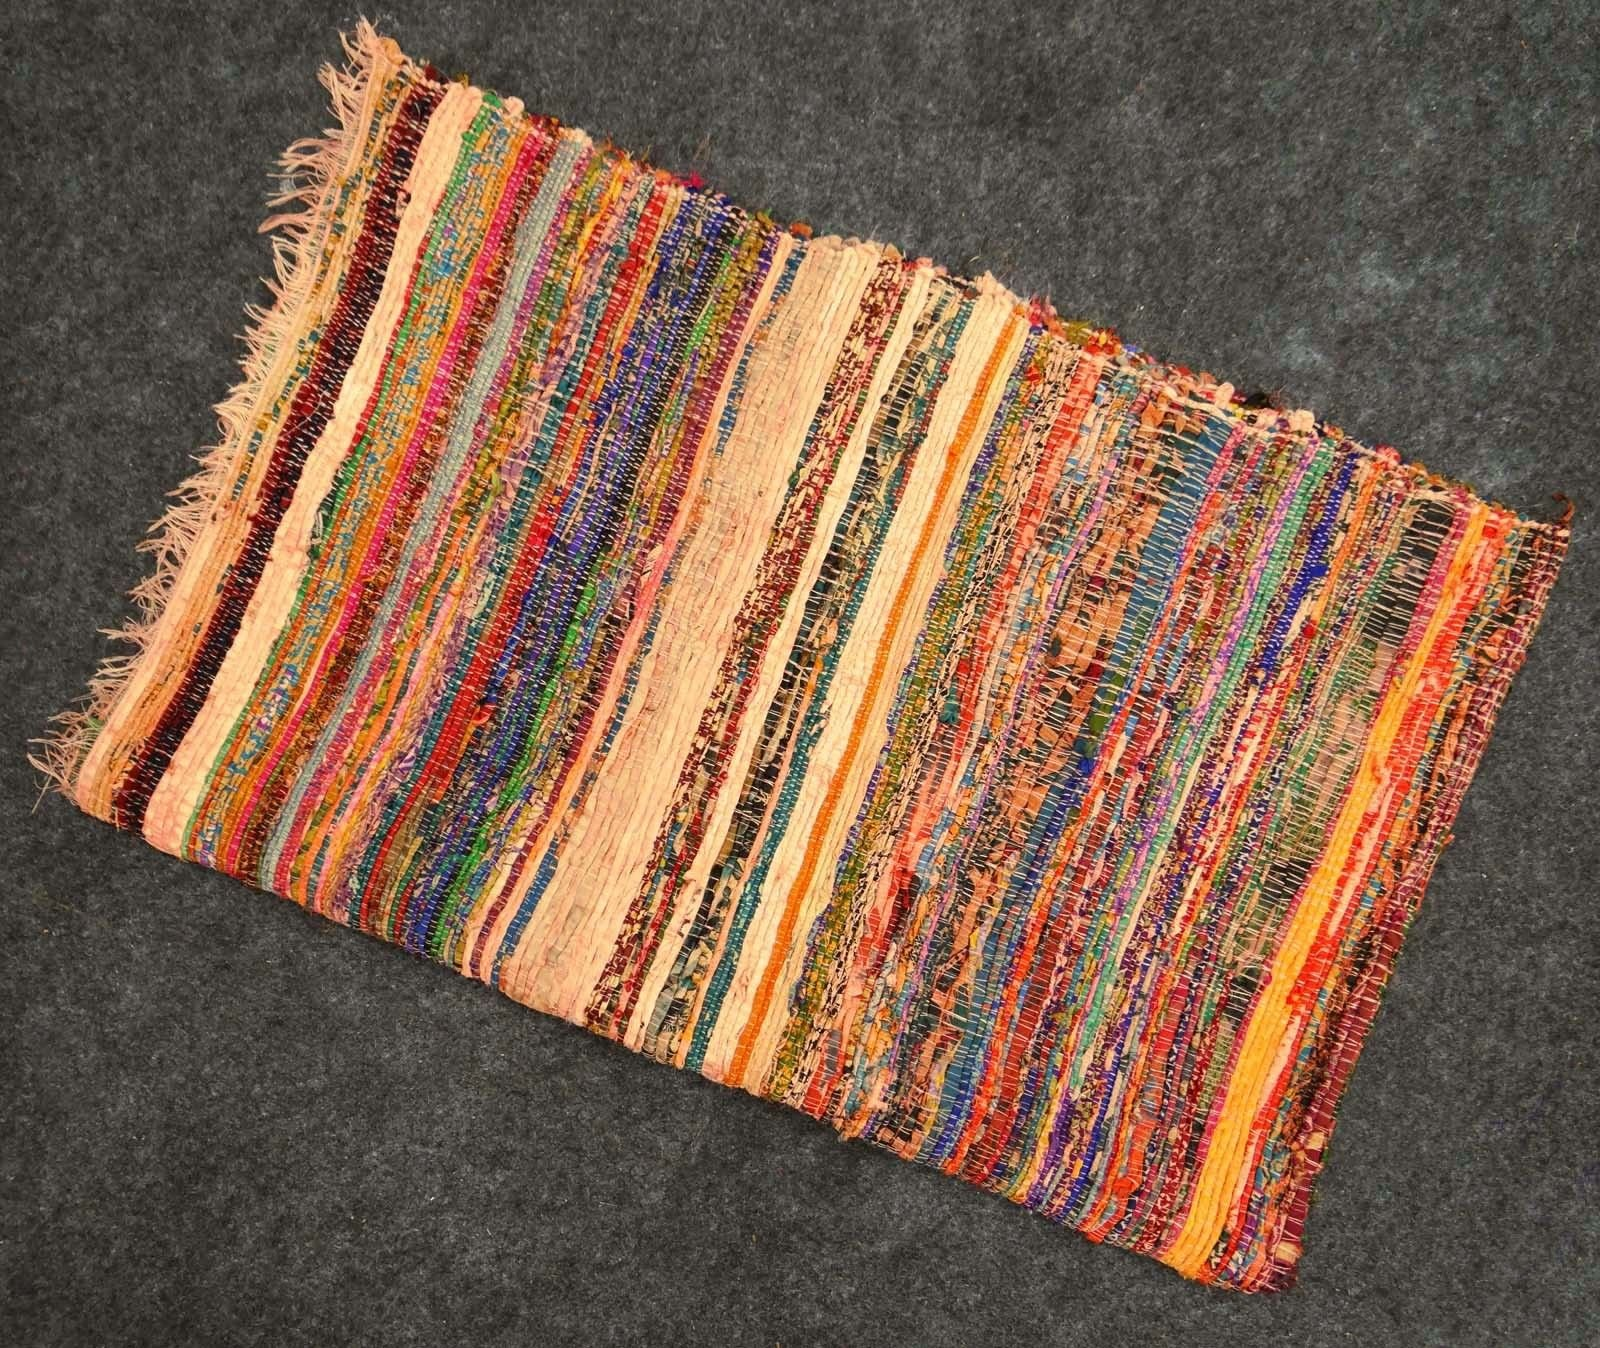 Fair Trade Handmade Rag Rug Chindi Rug Multi Colored